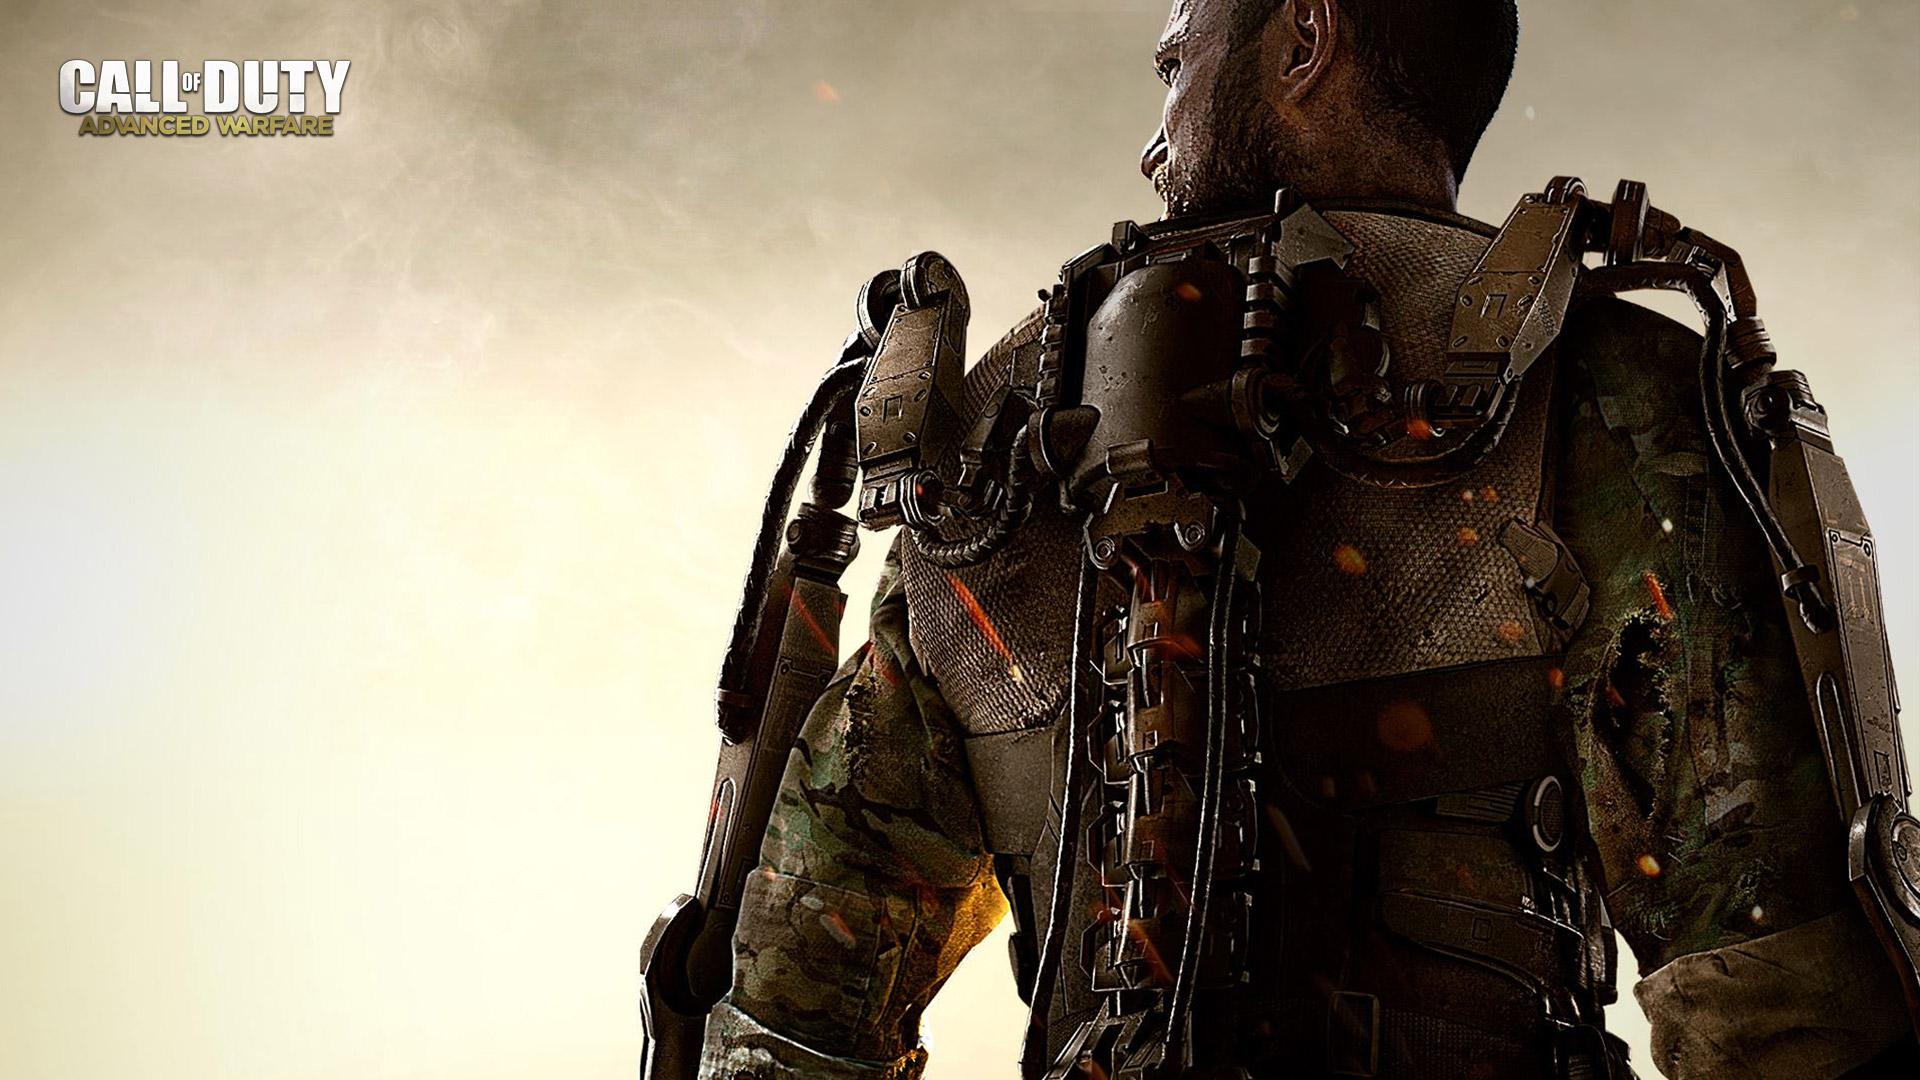 Call Of Duty: Advanced Warfare Papéis De Parede, Plano De